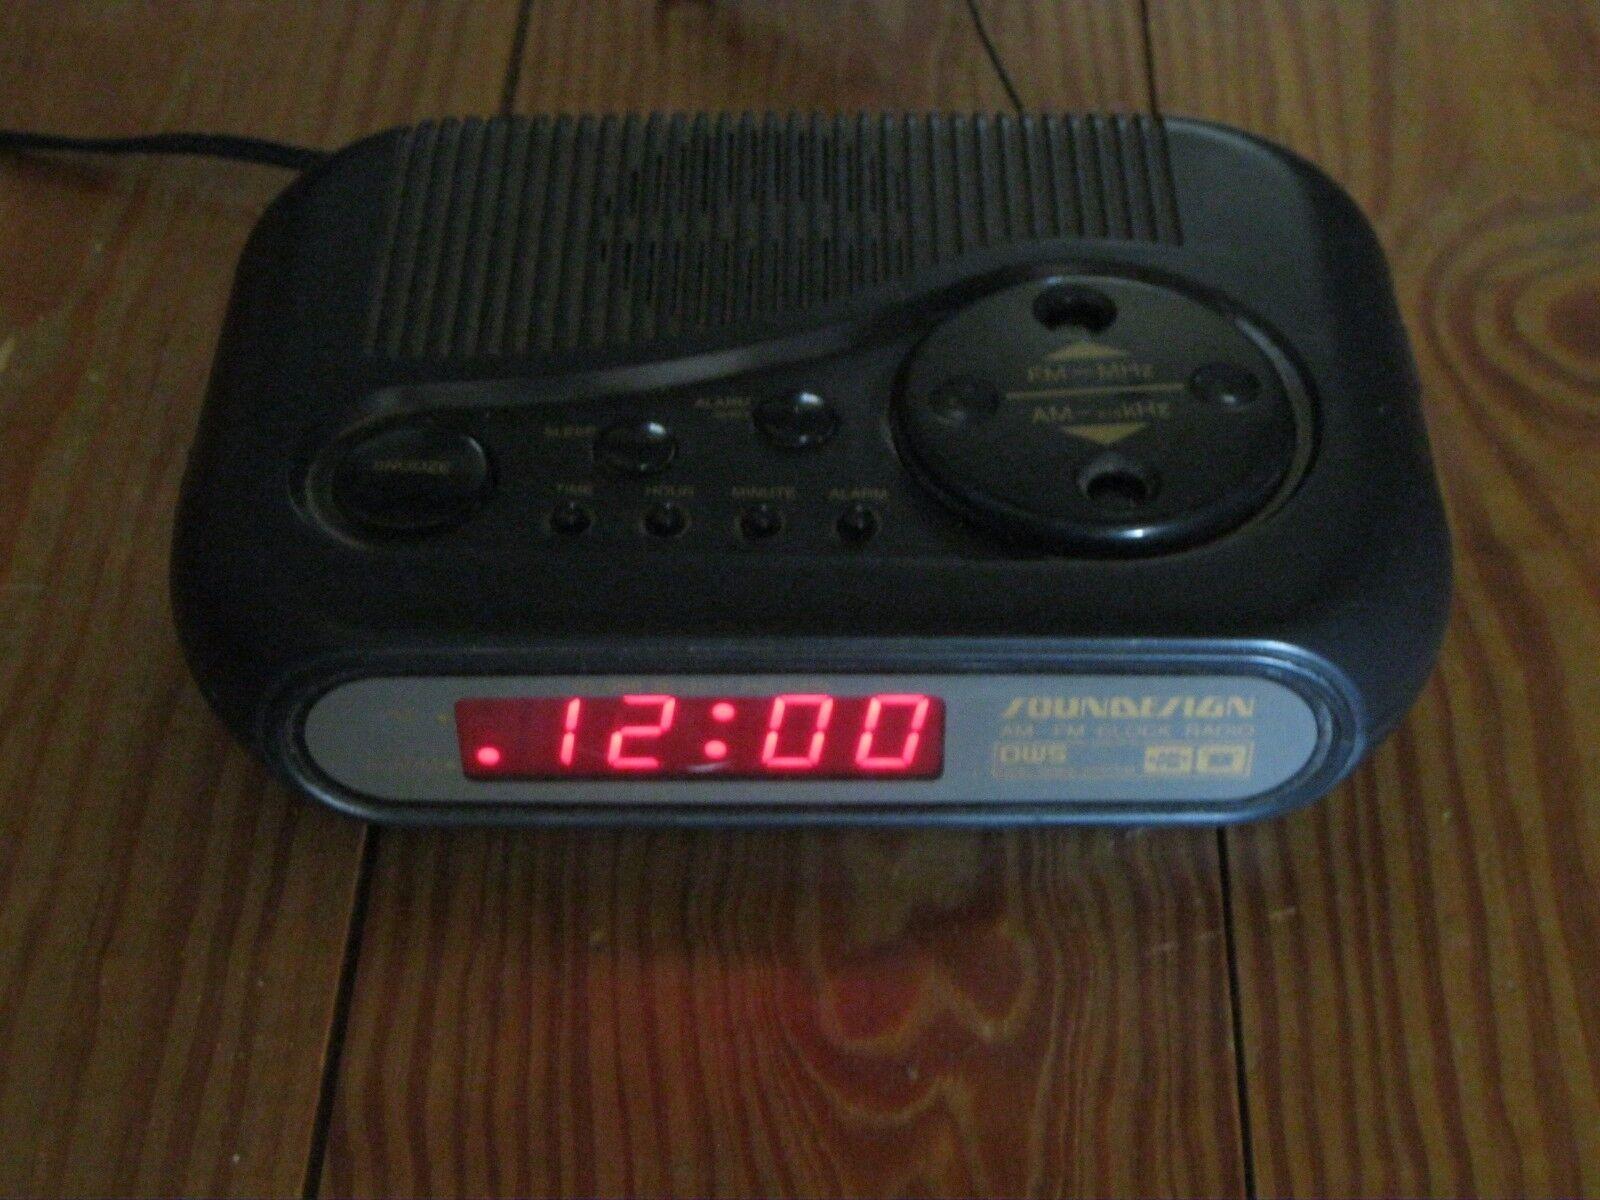 Soundesign black clock radio 3614blk